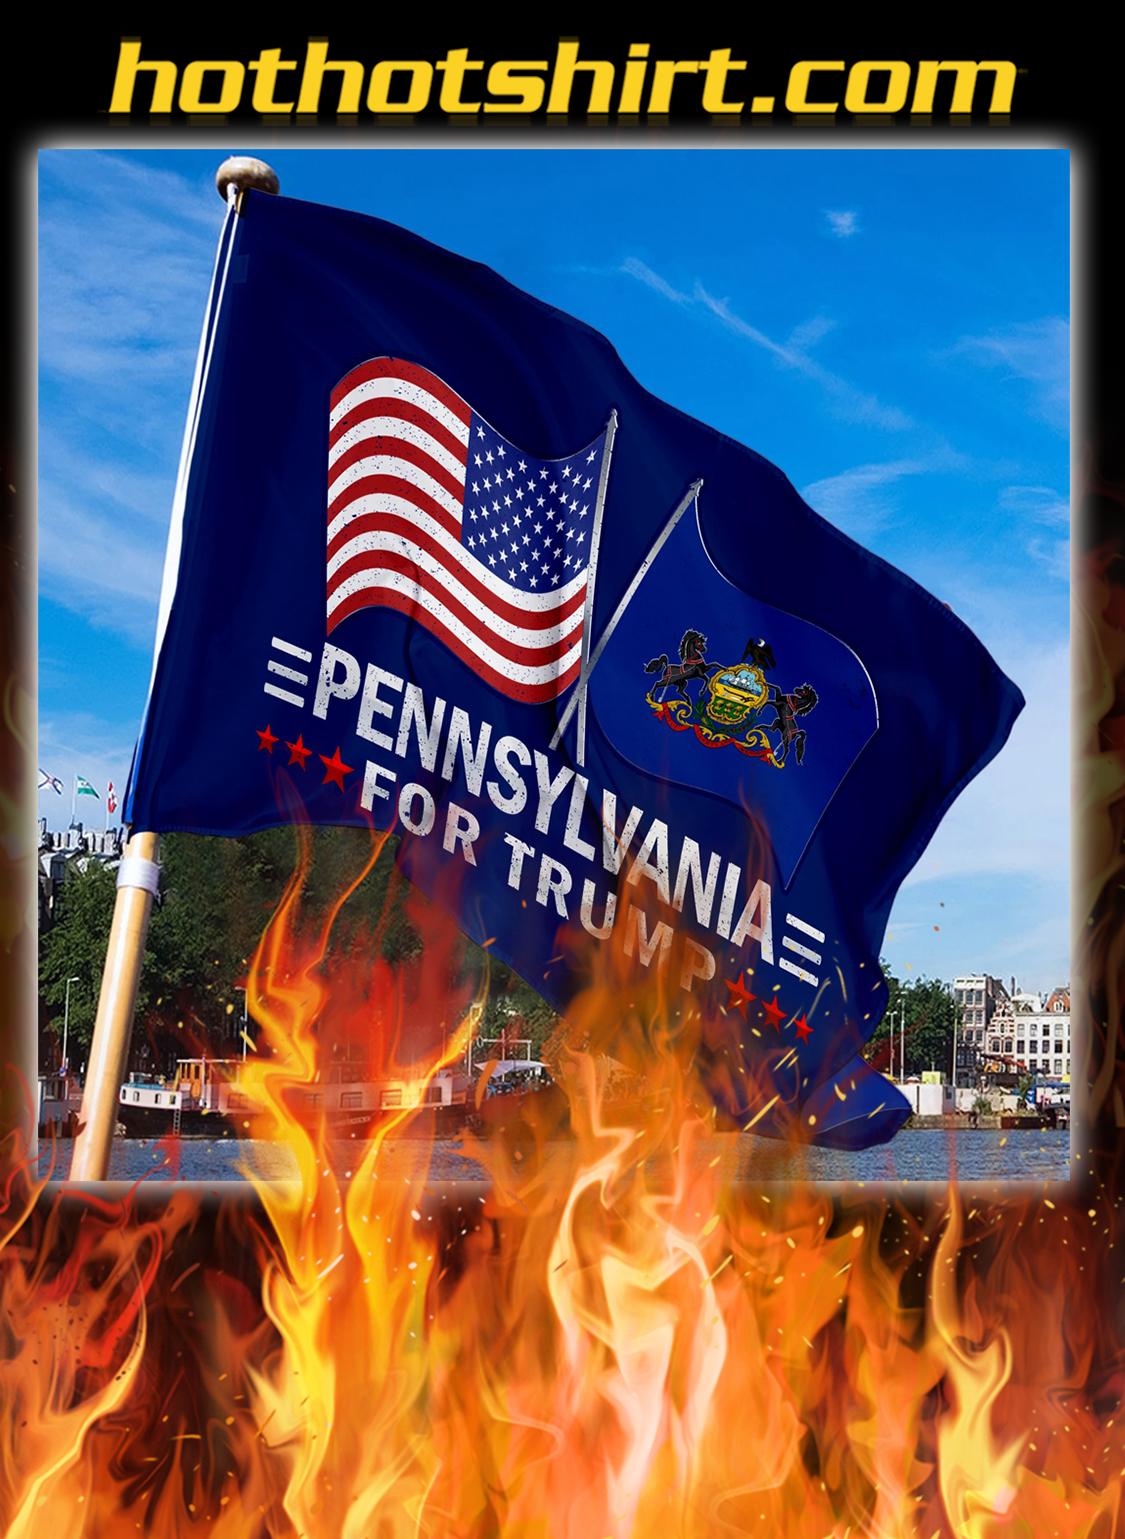 Pennsylvania For Trump Flag- pic 3